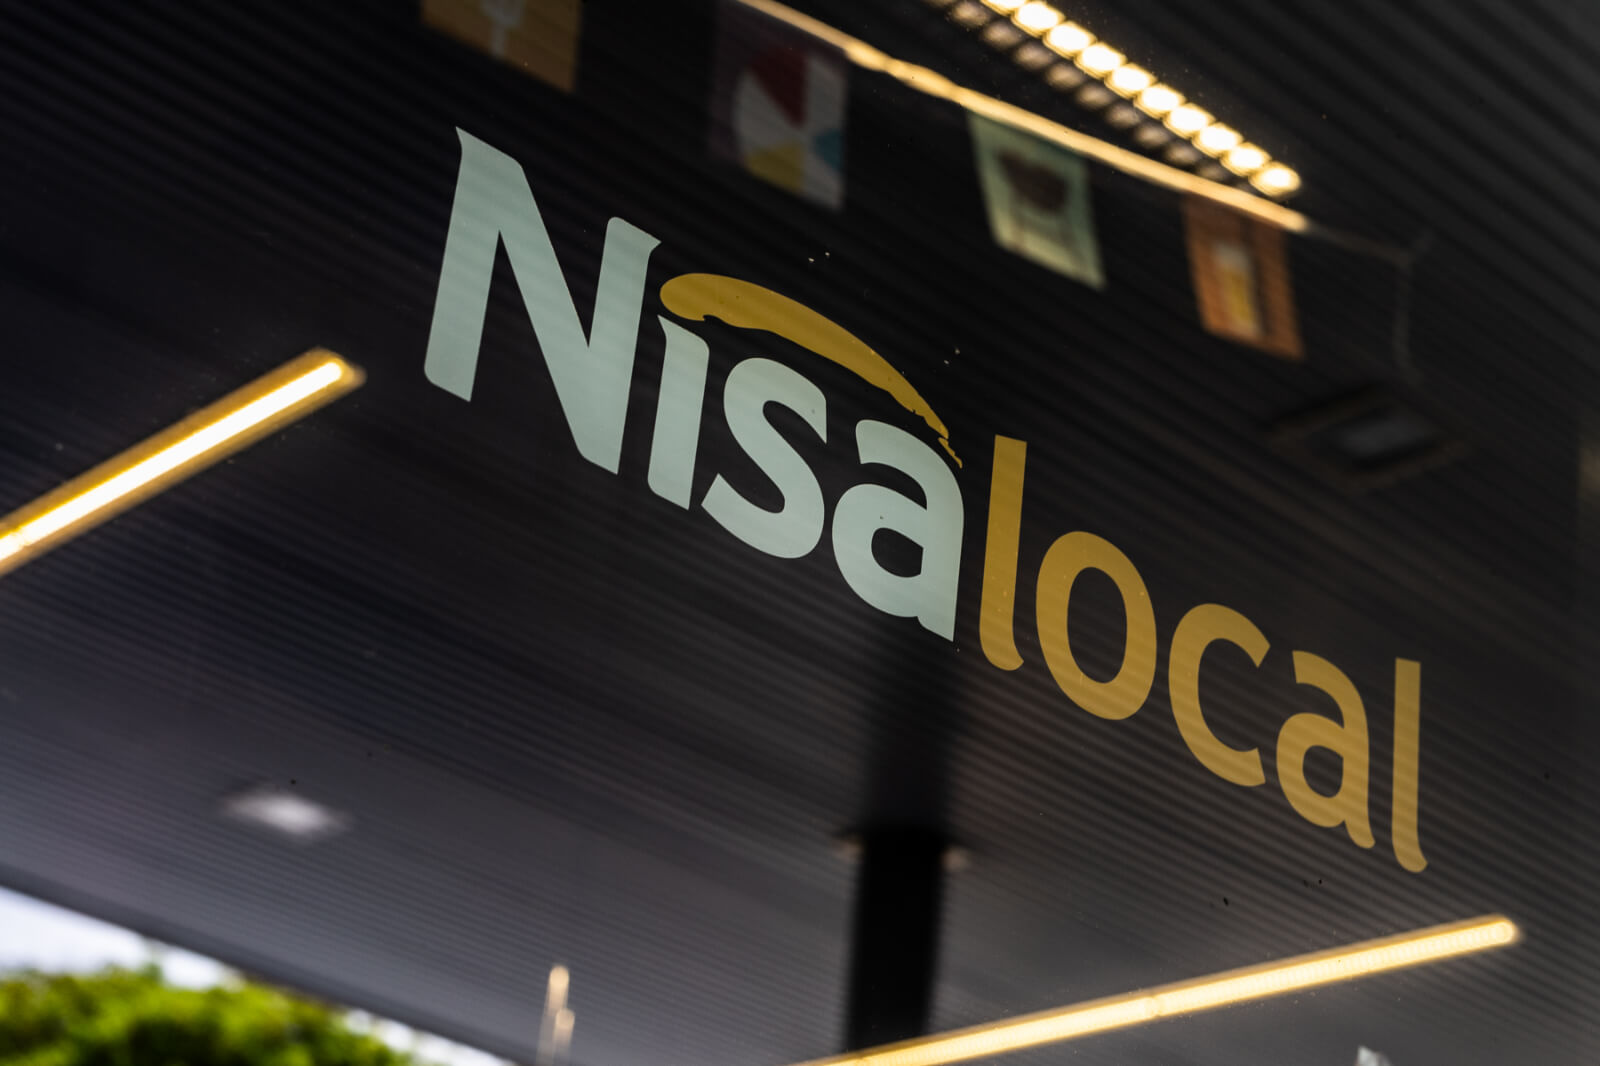 Nisa brand at Ascona garage